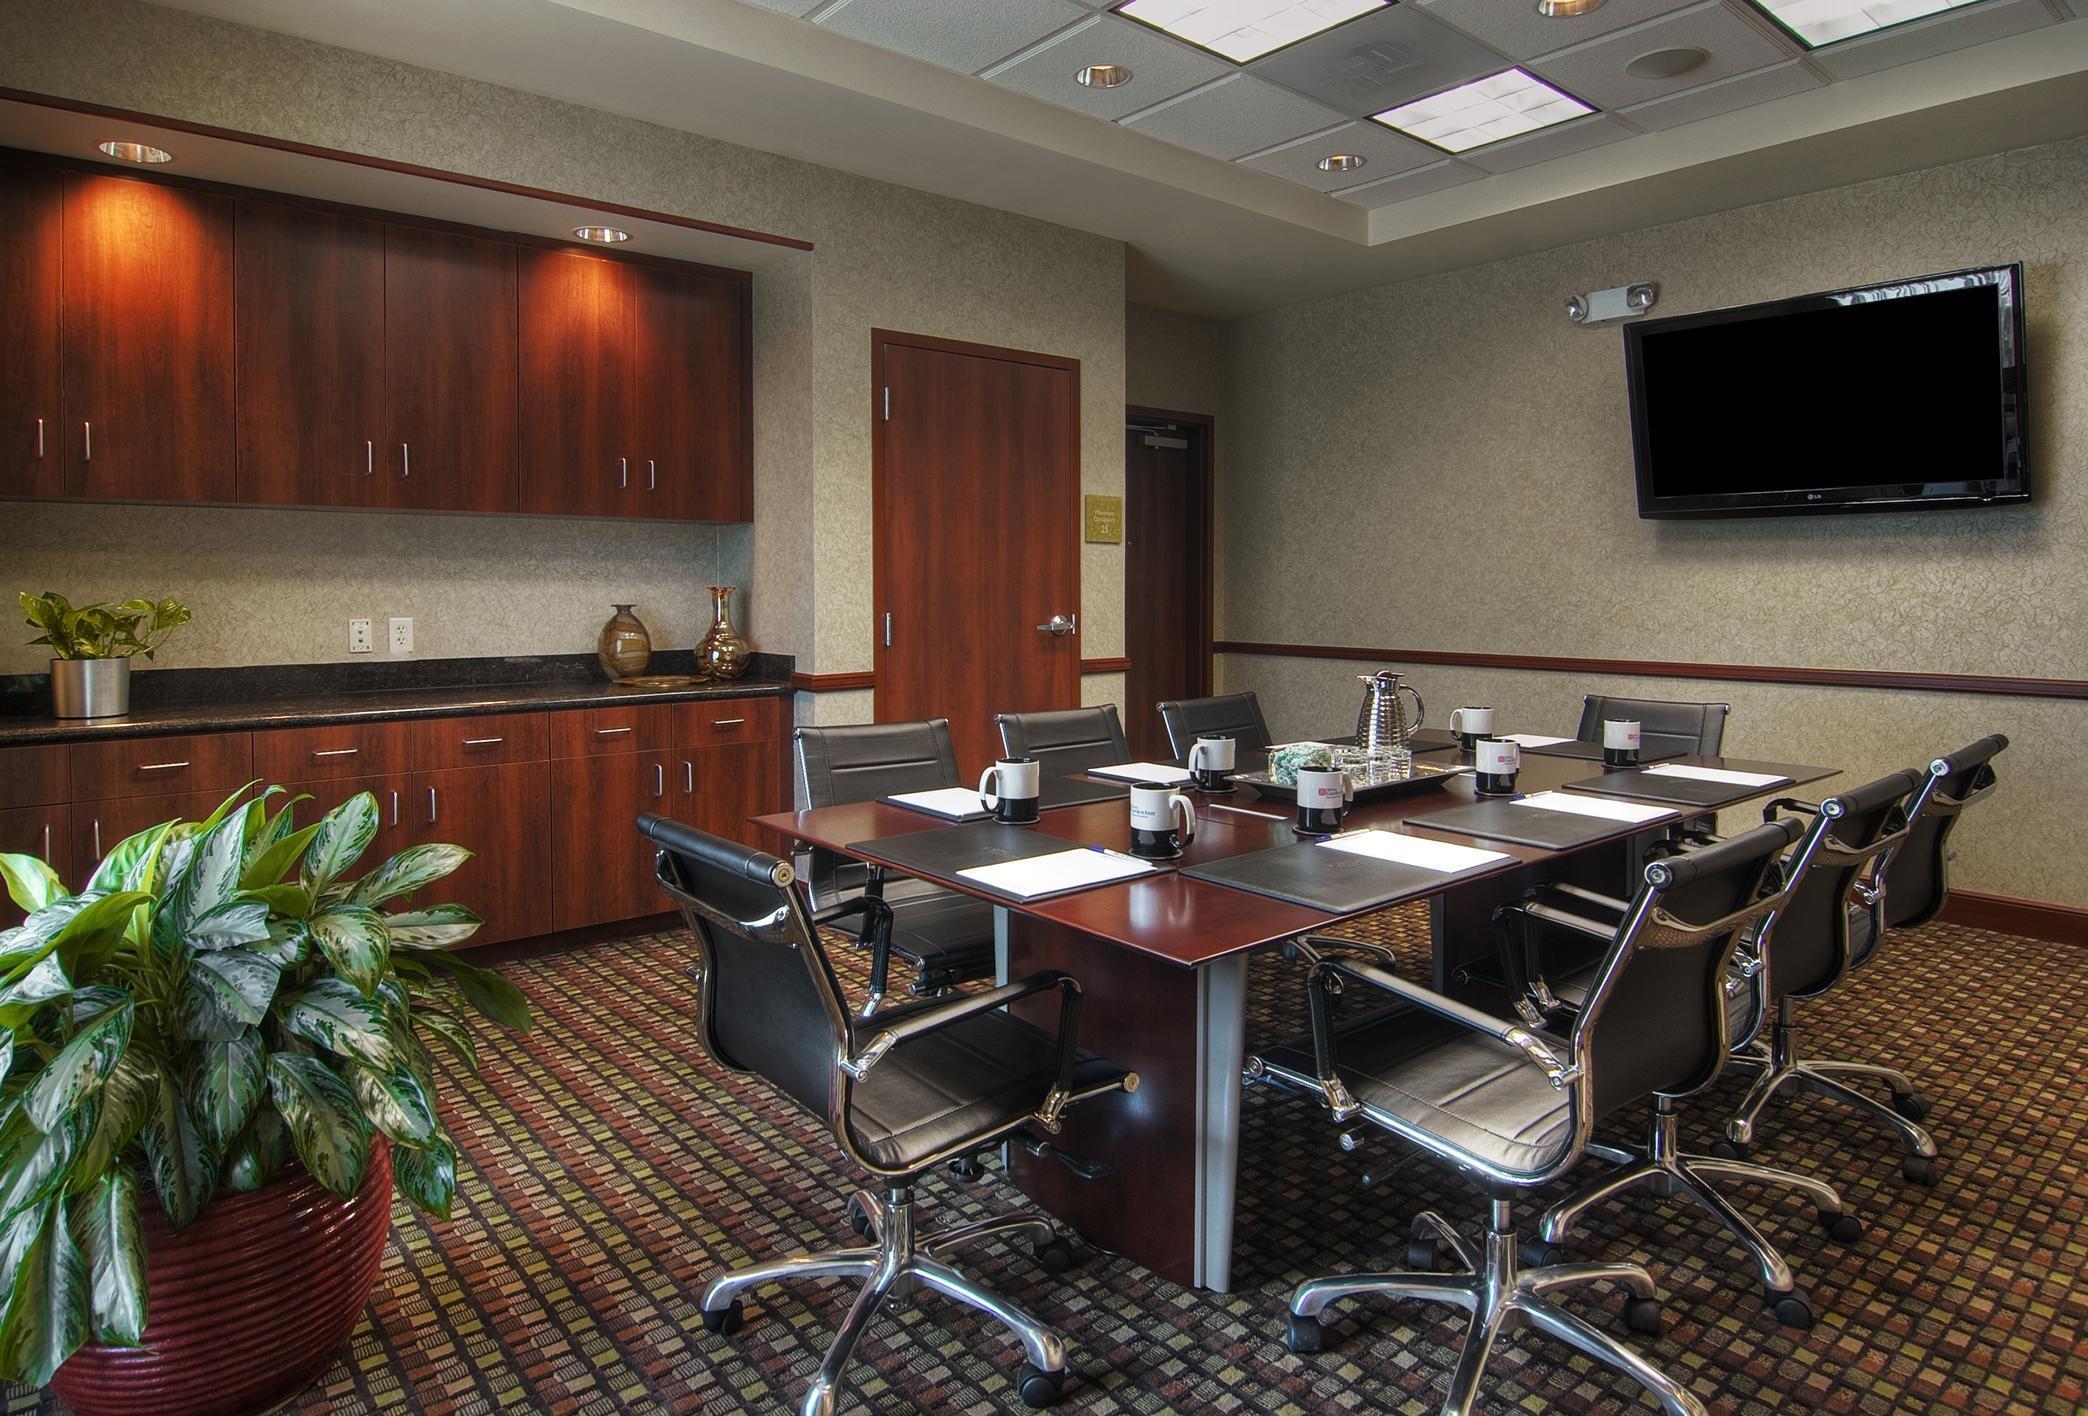 Hilton Garden Inn Houston-Pearland image 13